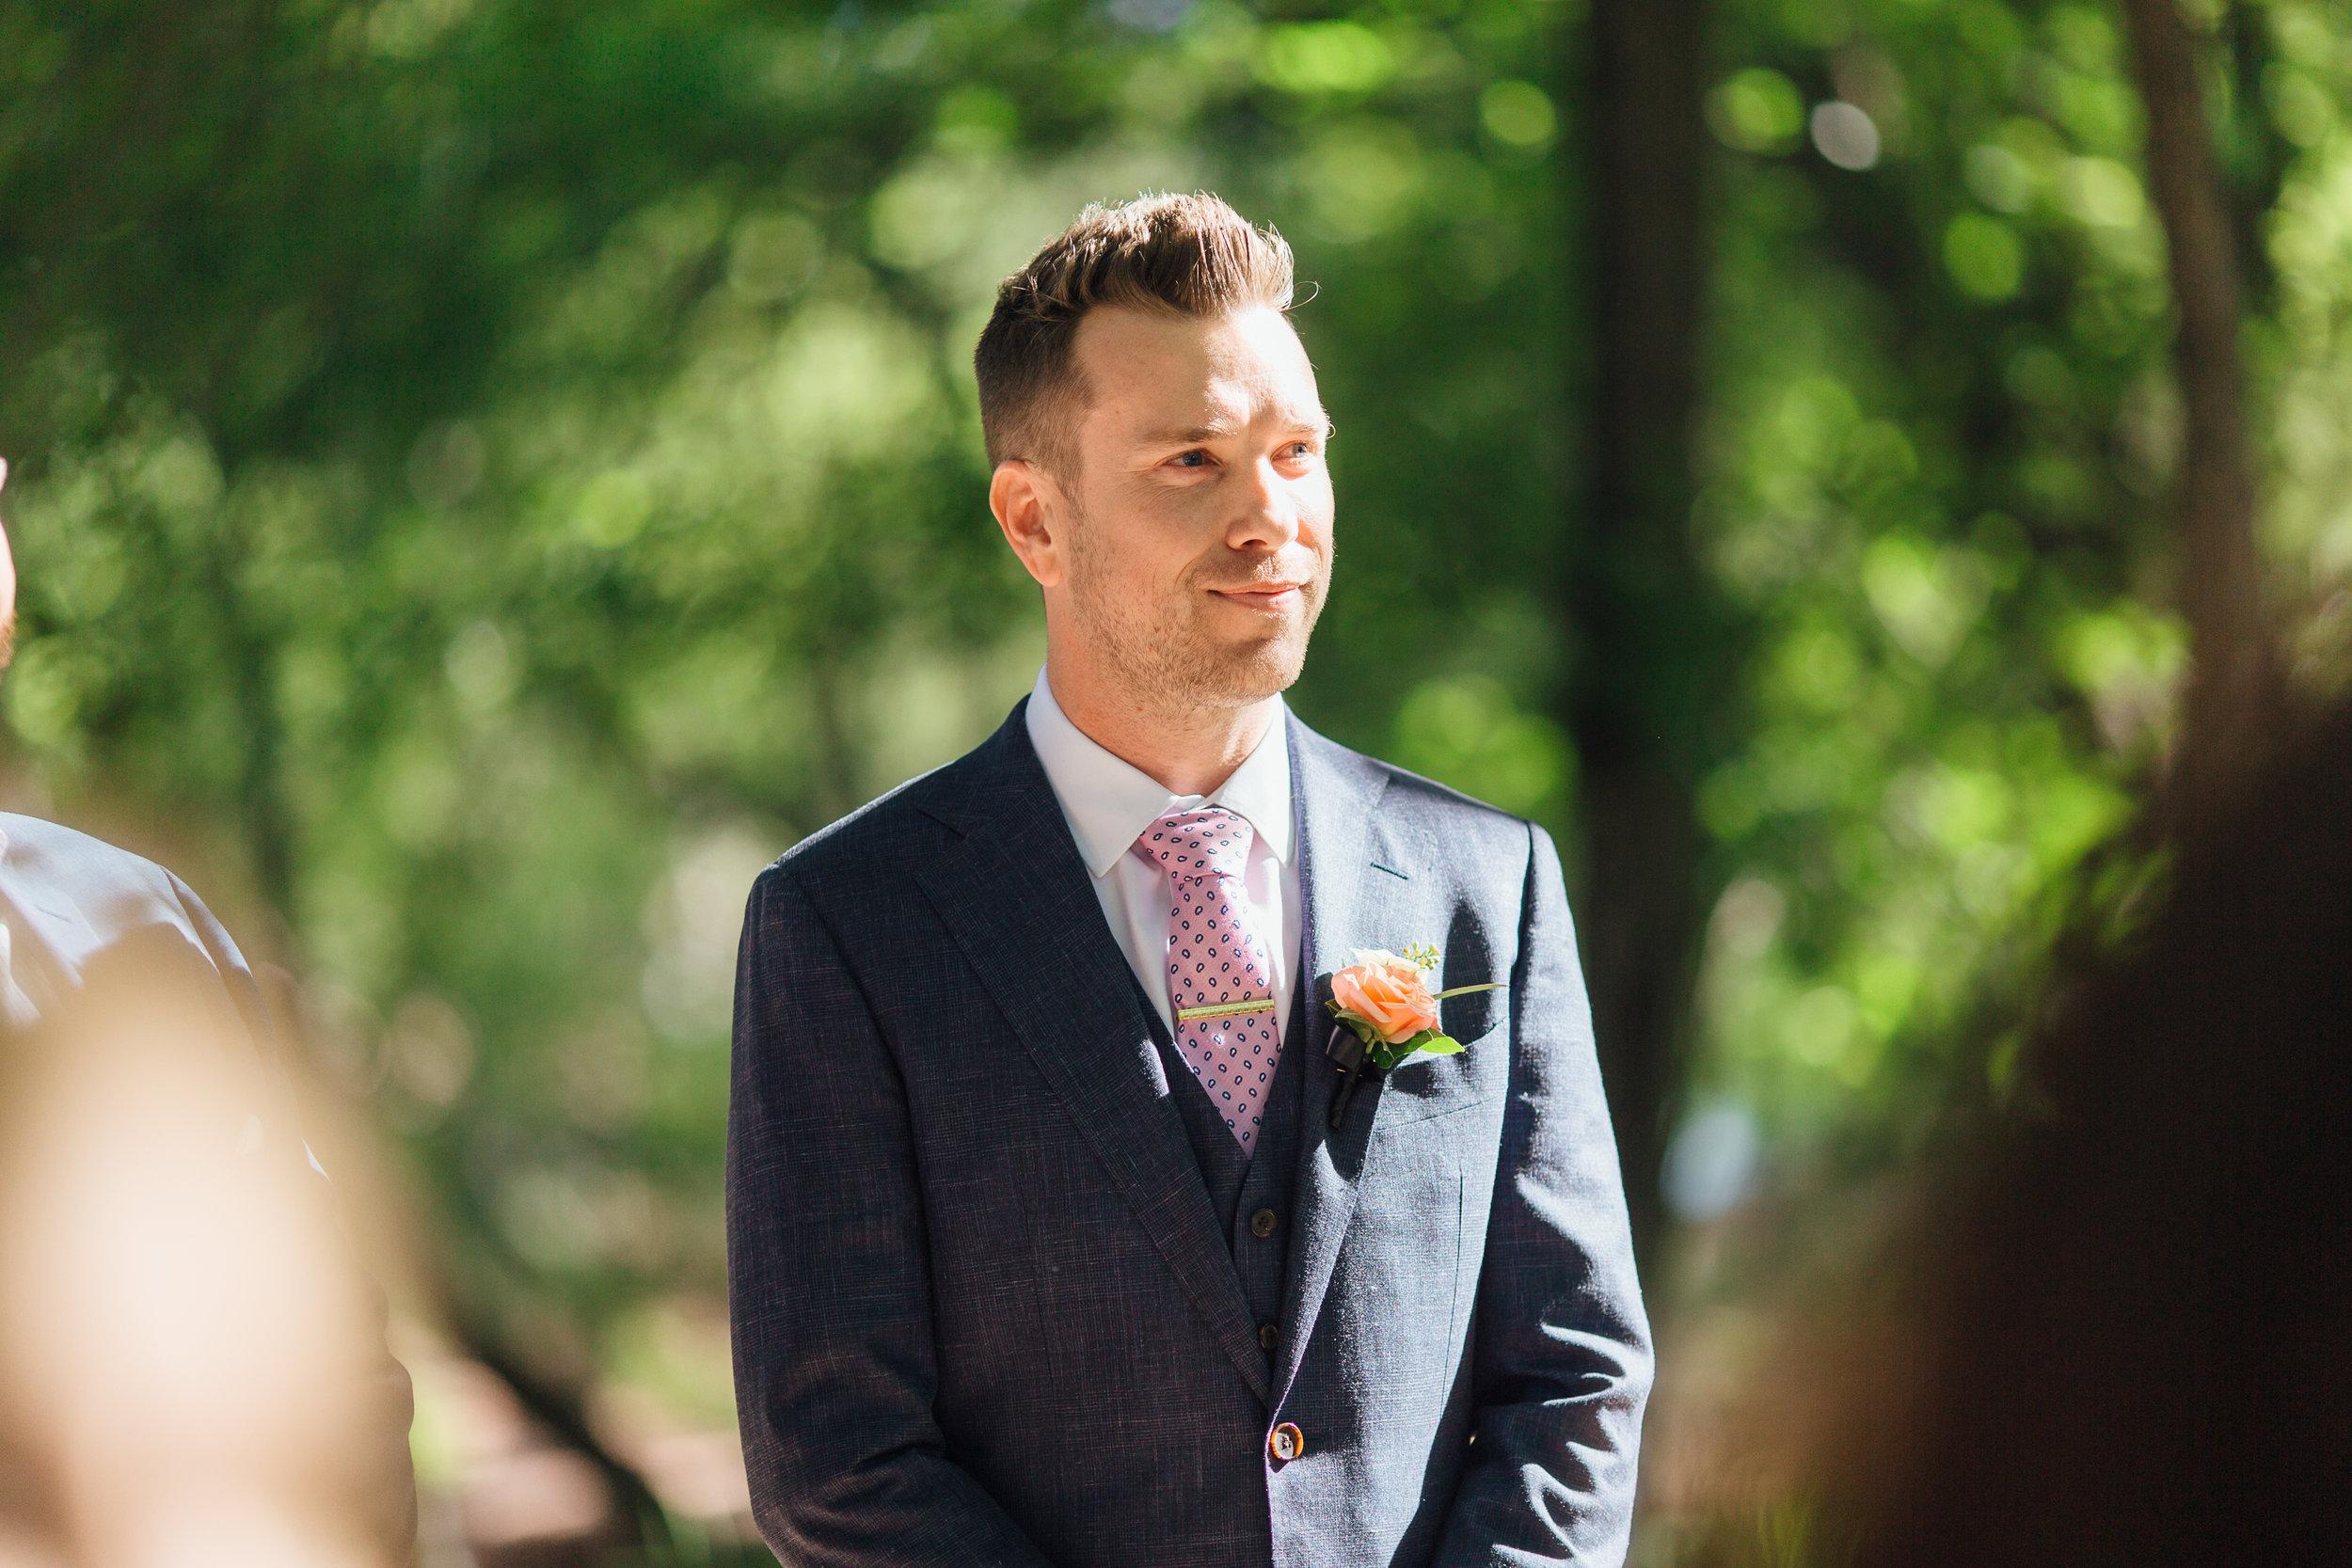 LMW-Sedona-lauberge-wedding-5281.jpg